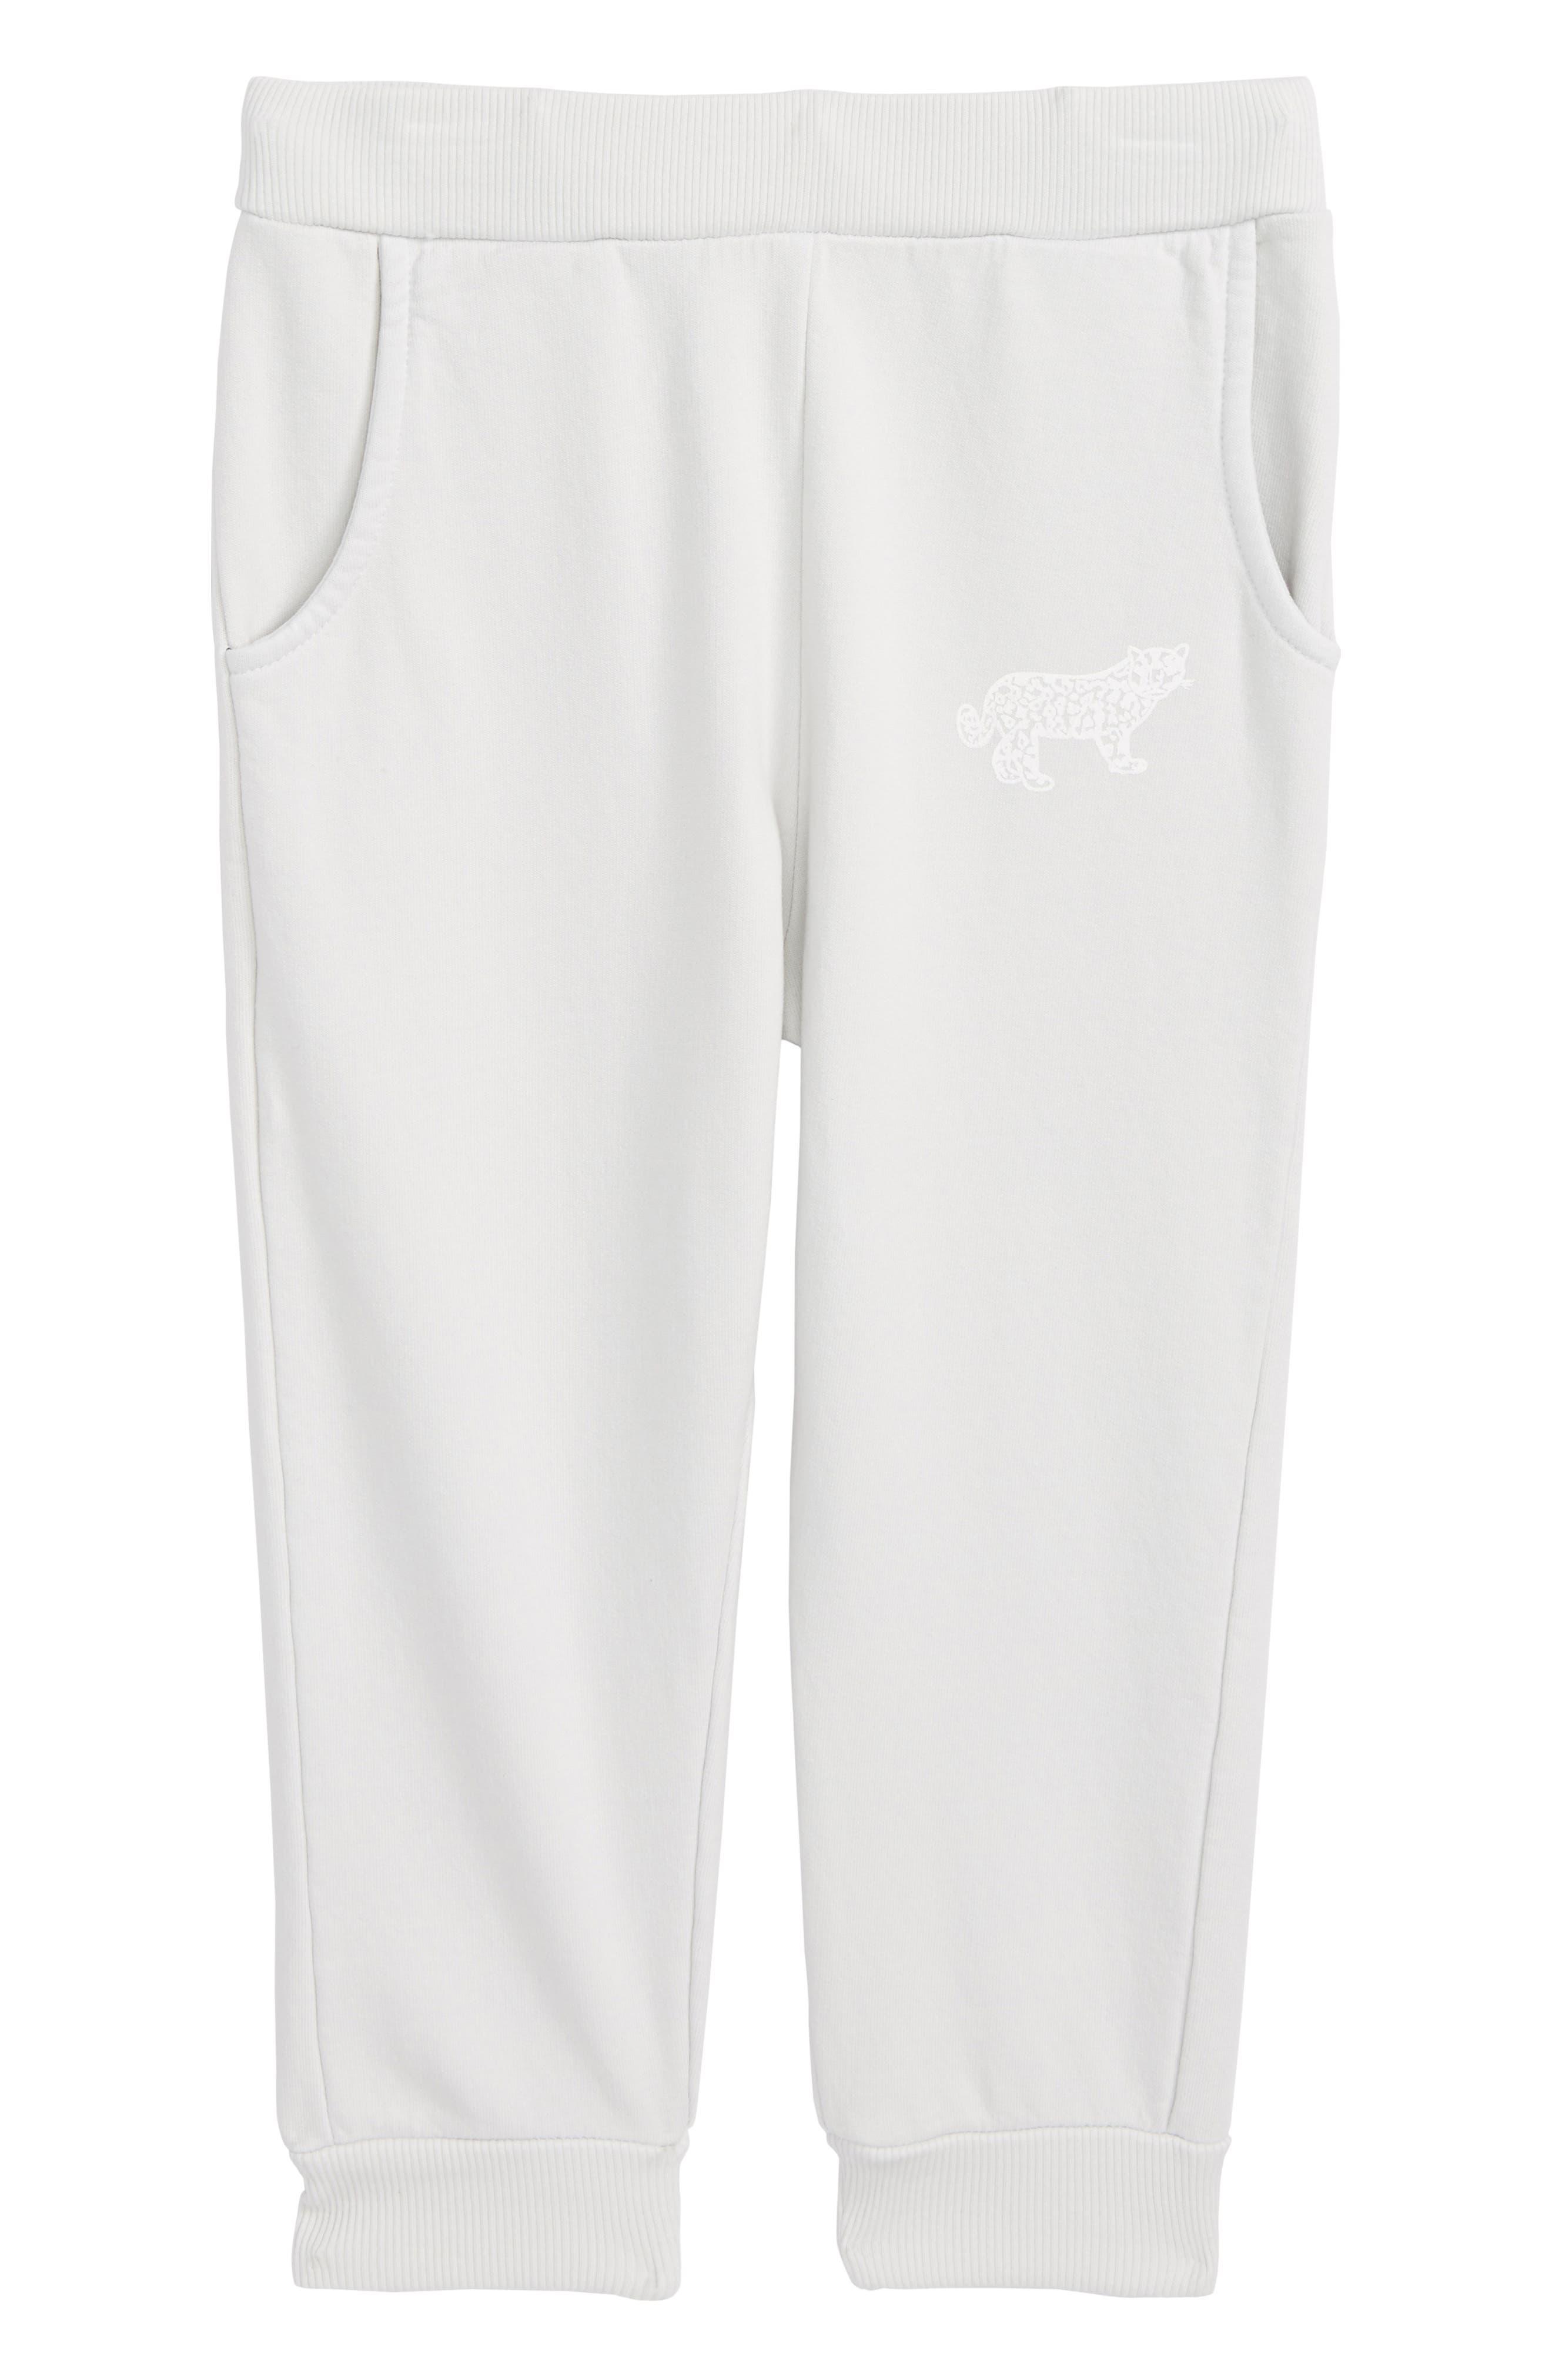 Ryan Jogger Pants,                         Main,                         color, Pebble